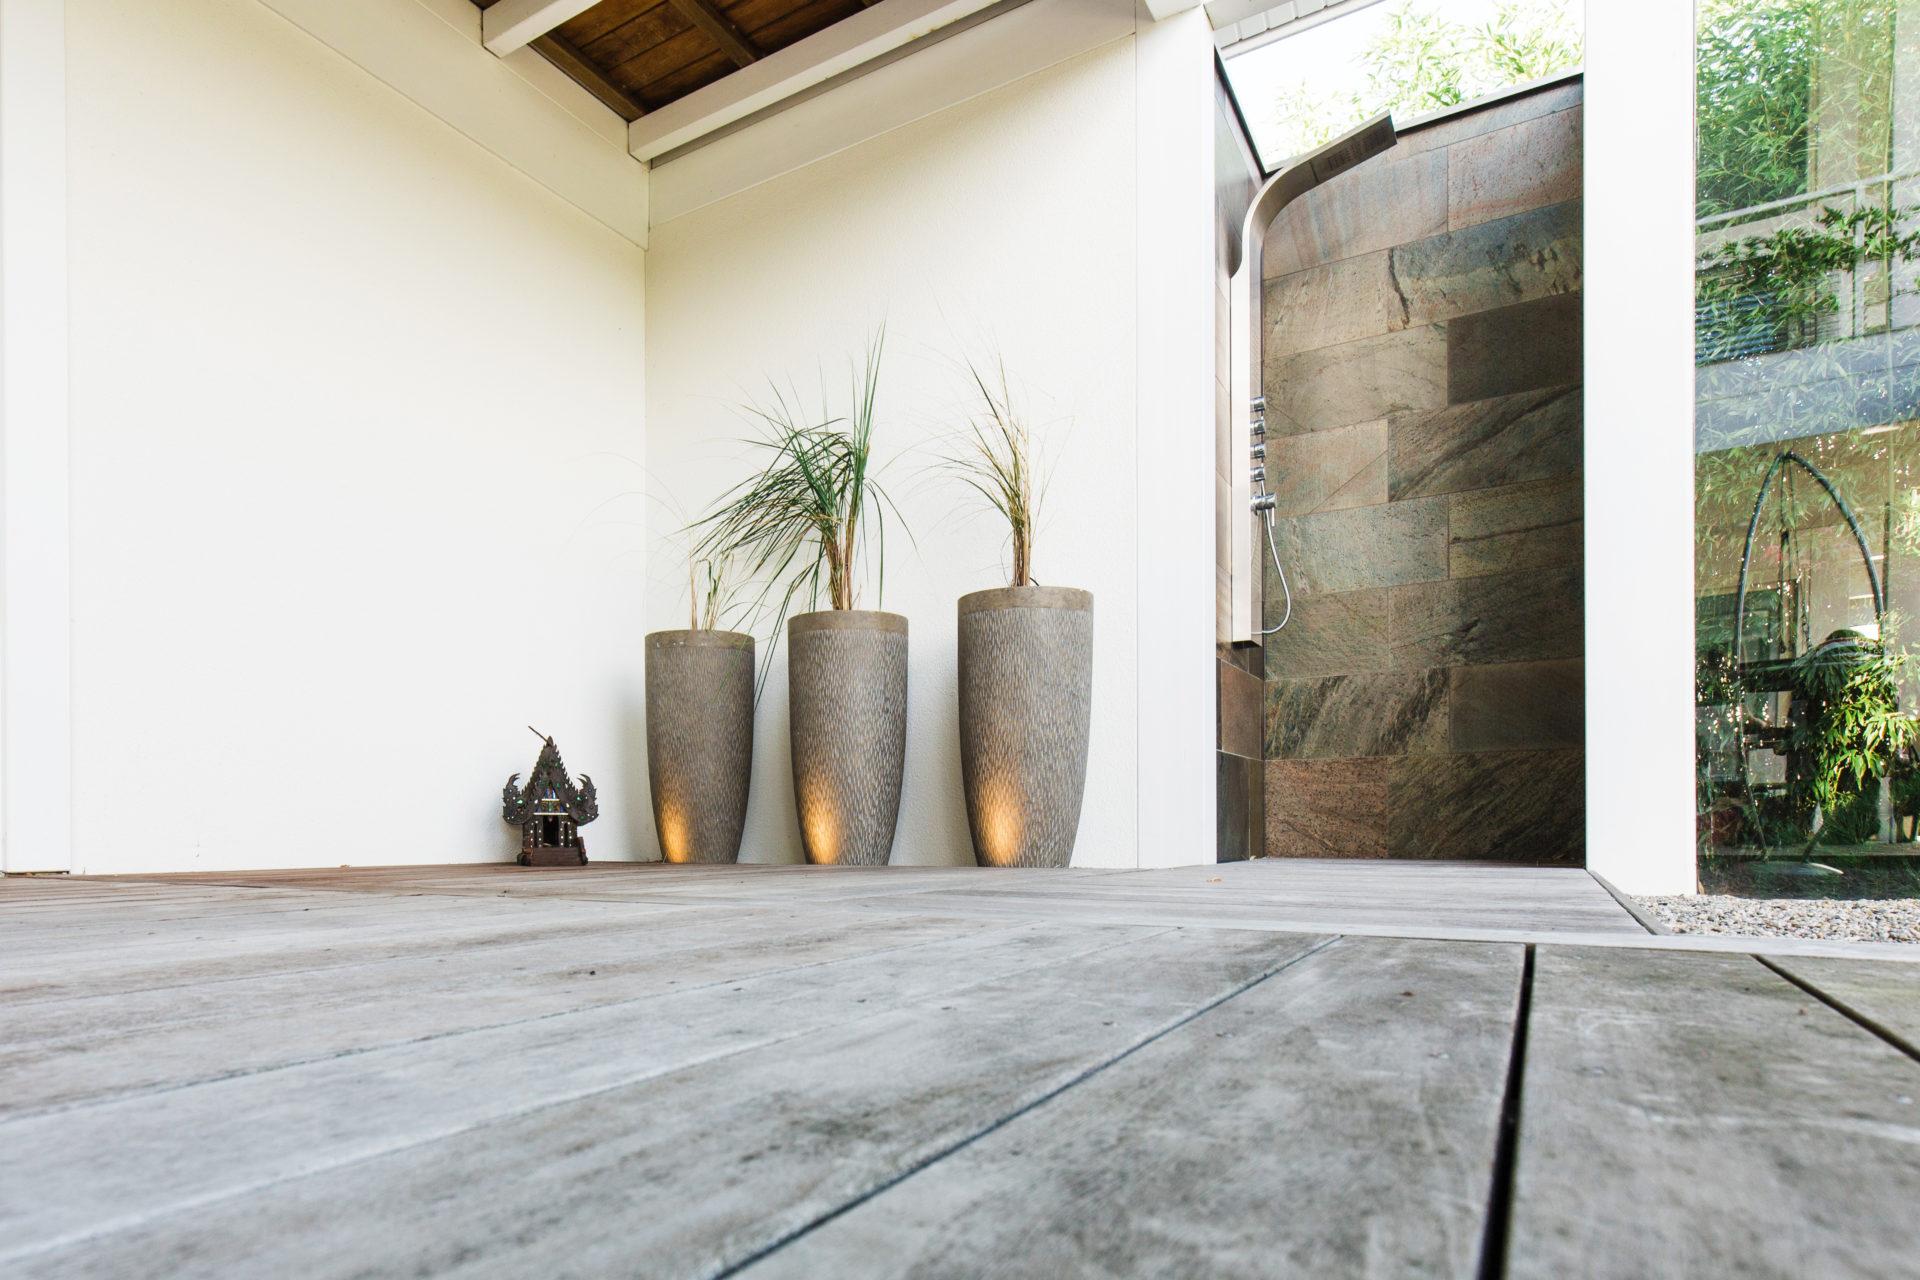 fachwerkhaus landhaus modern concentus moderne fachwerkh user. Black Bedroom Furniture Sets. Home Design Ideas